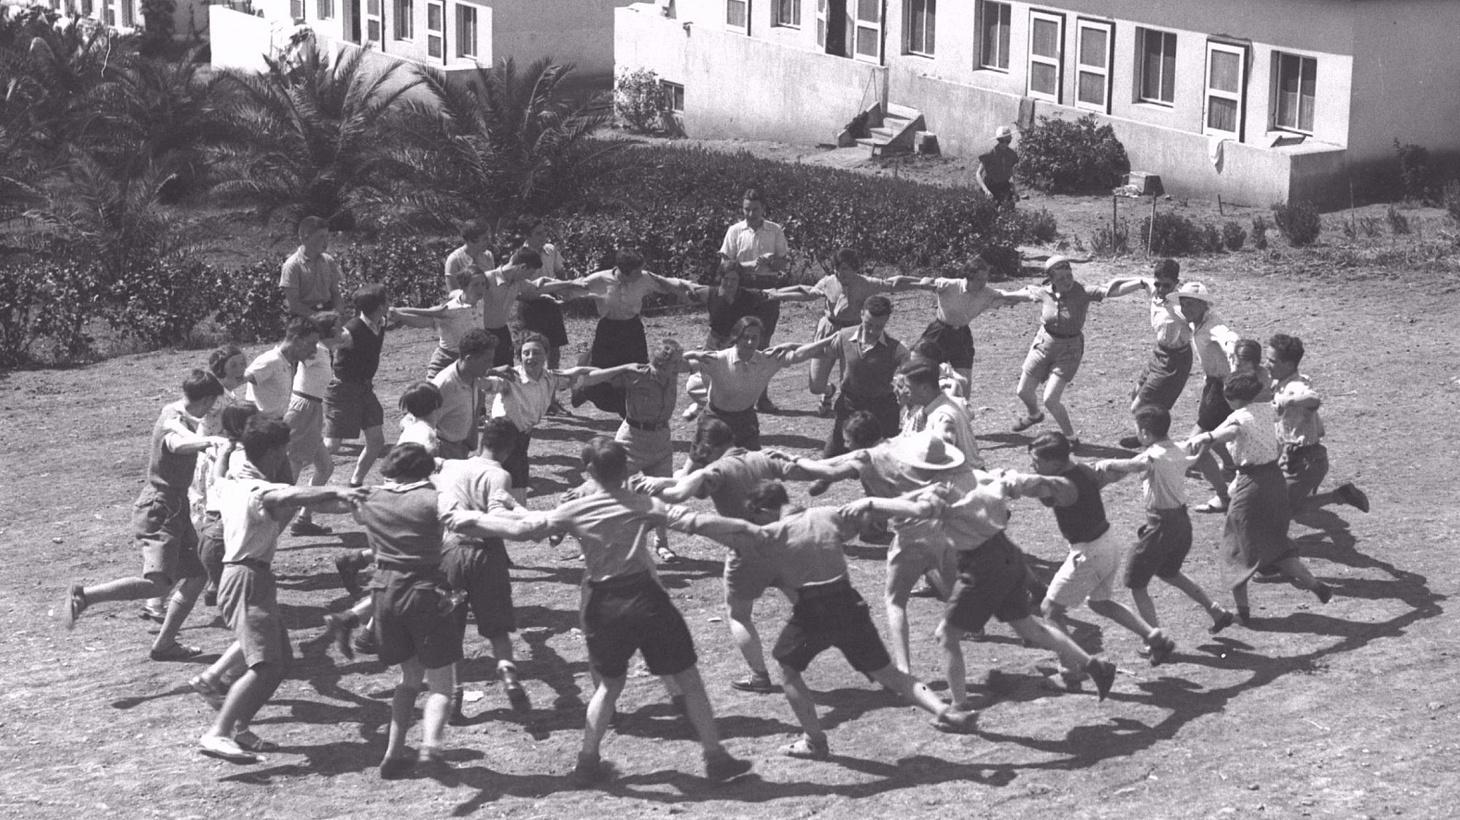 Youth Aliya members from Germany dancing the hora at Kibbutz Ein Harod, 1936.